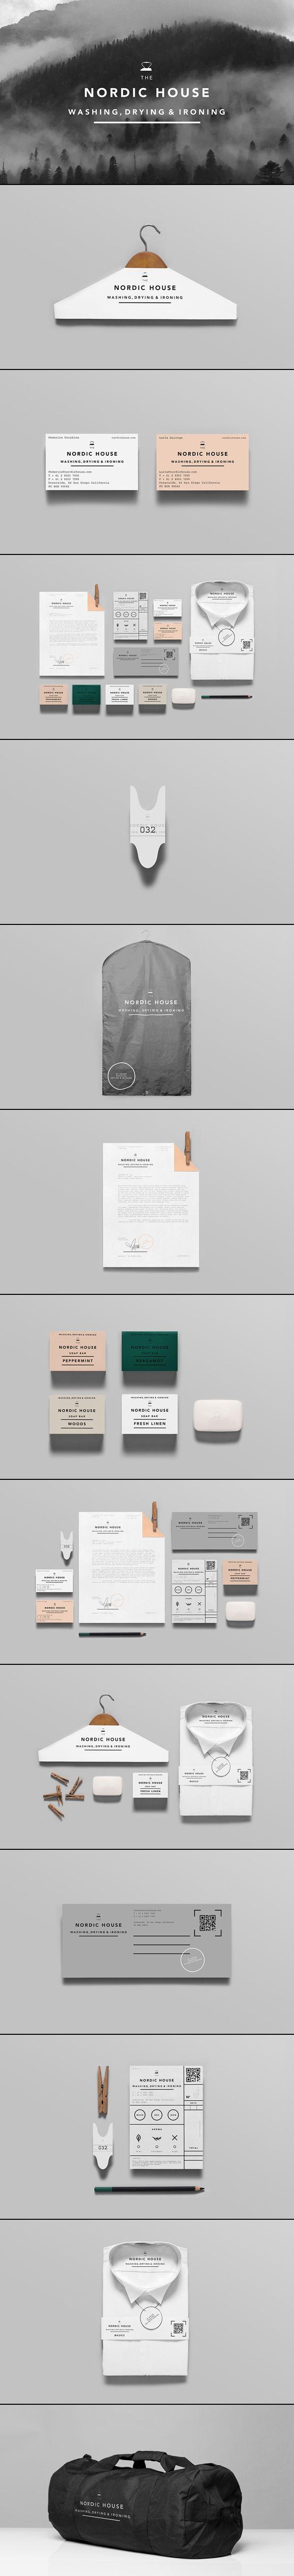 Nordic House brand identity